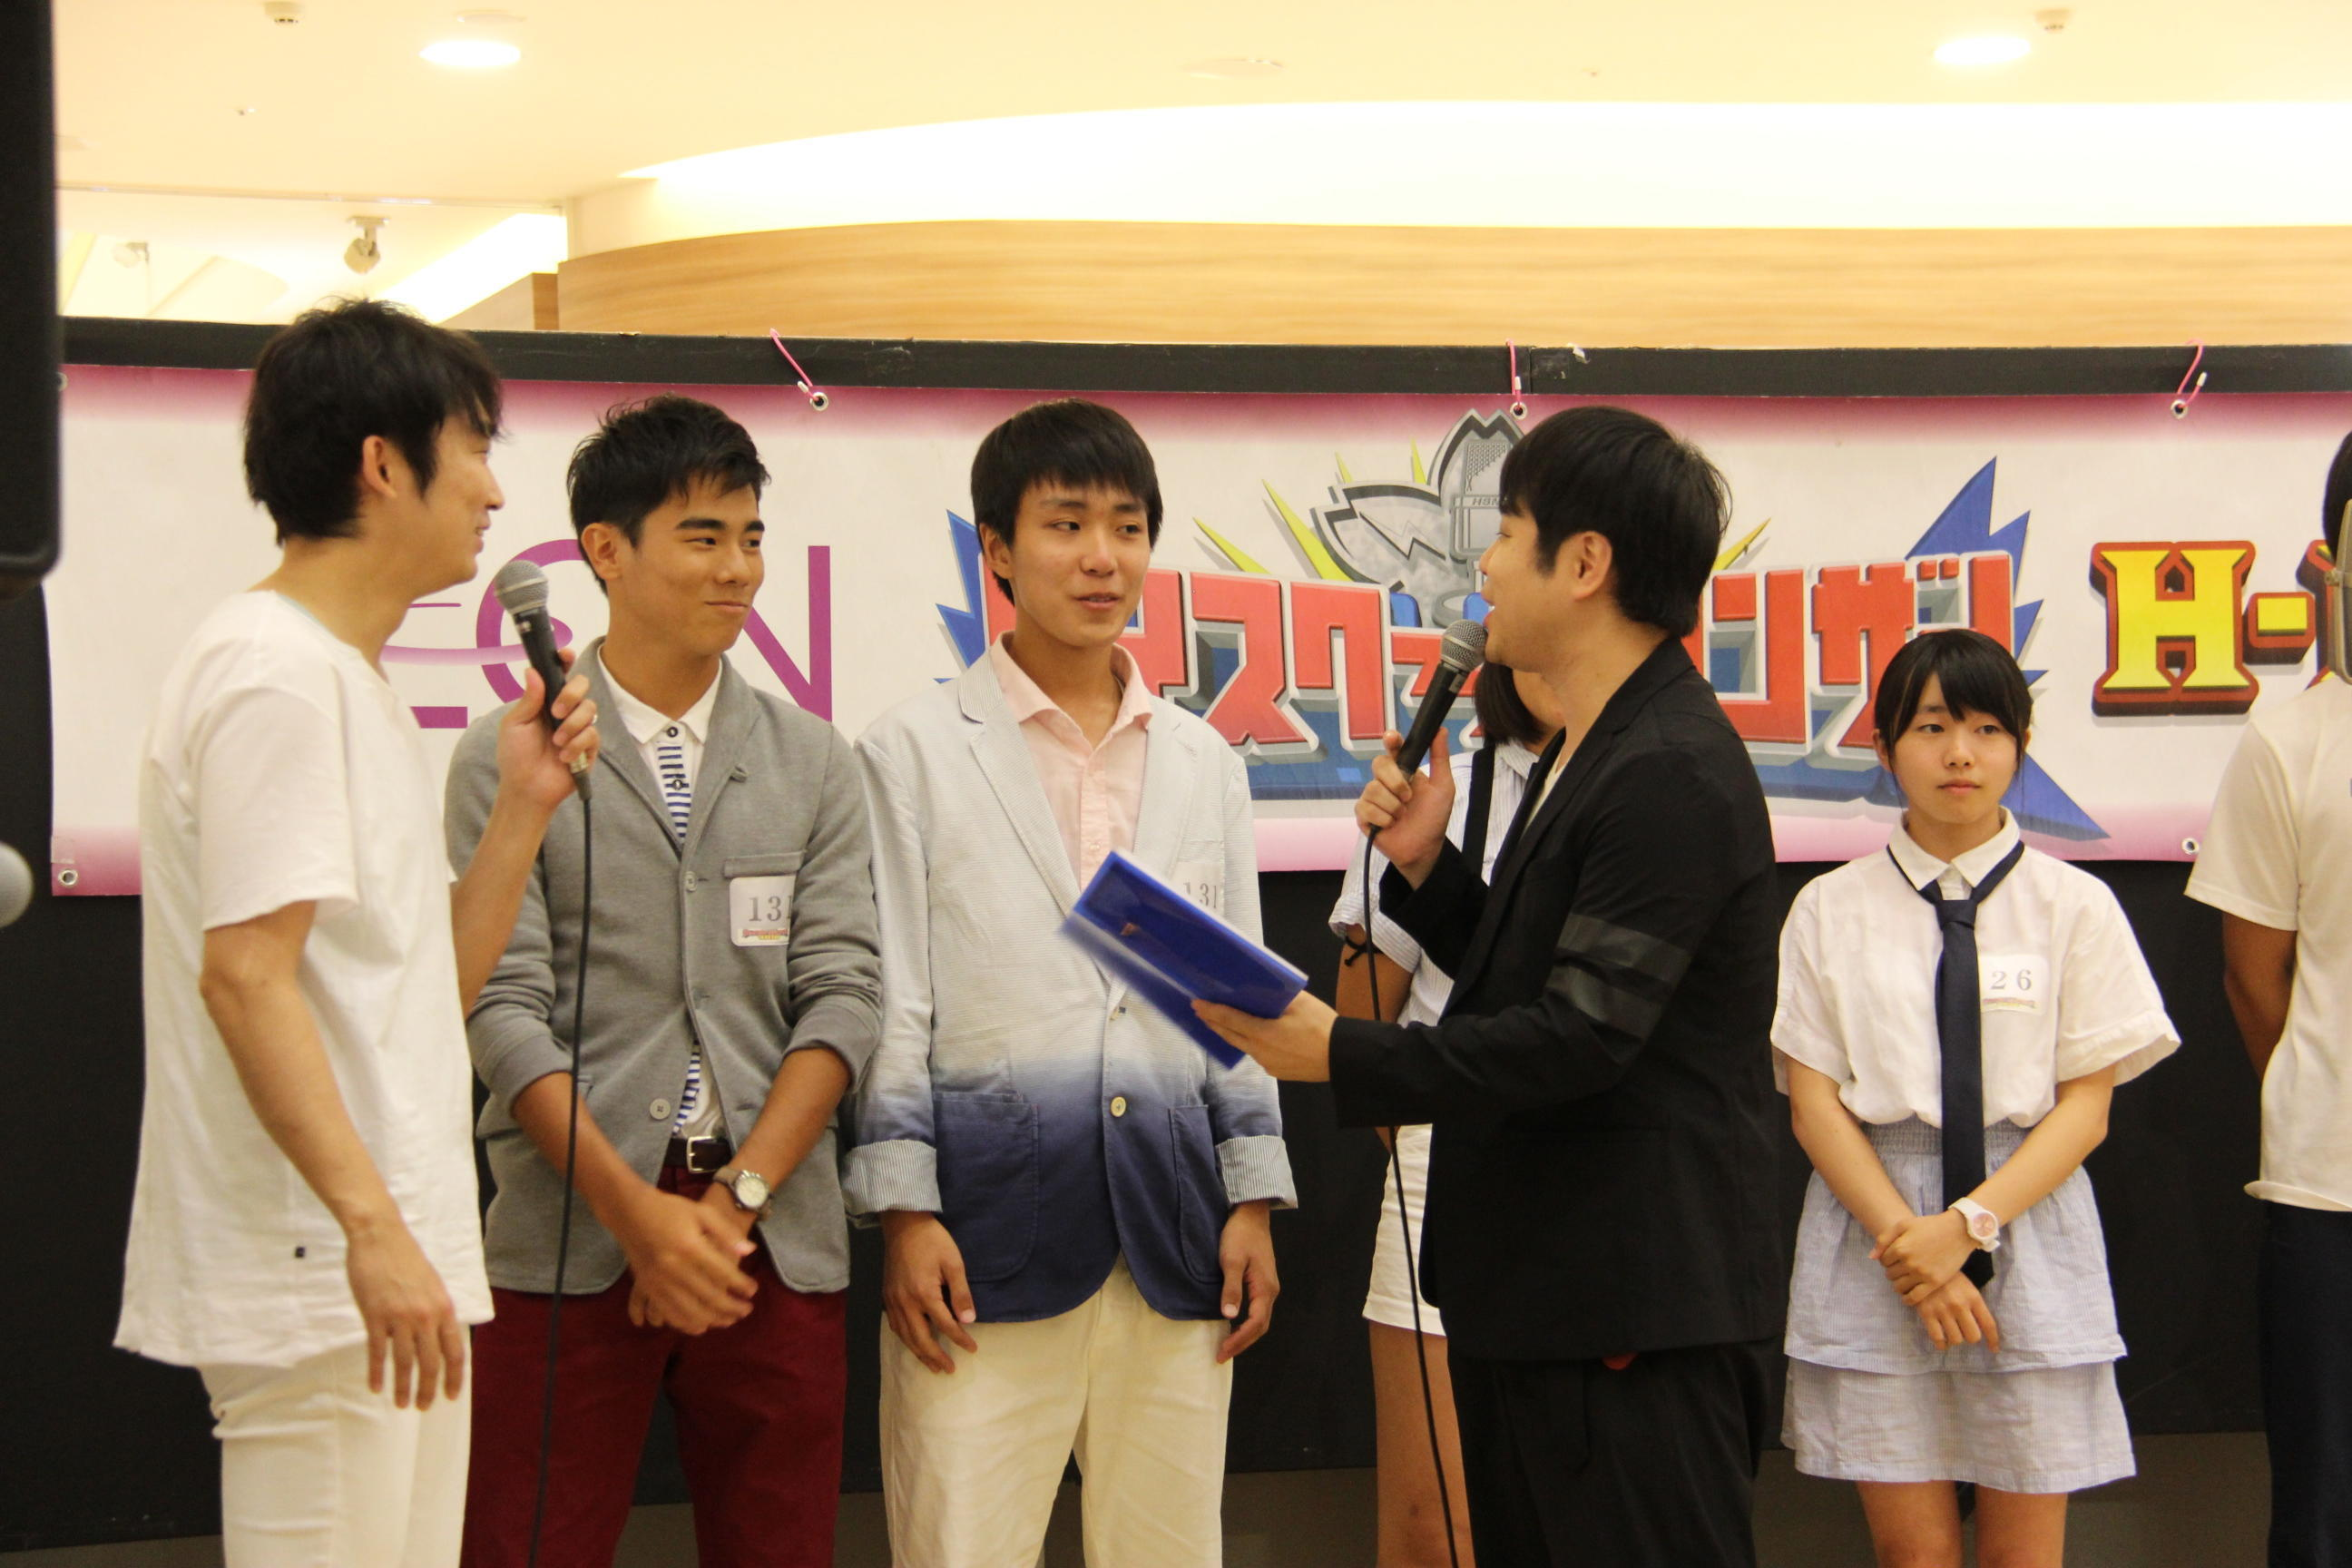 http://news.yoshimoto.co.jp/20180813131449-21e24e7dd5821247f105db86de20118882b2ae03.jpg